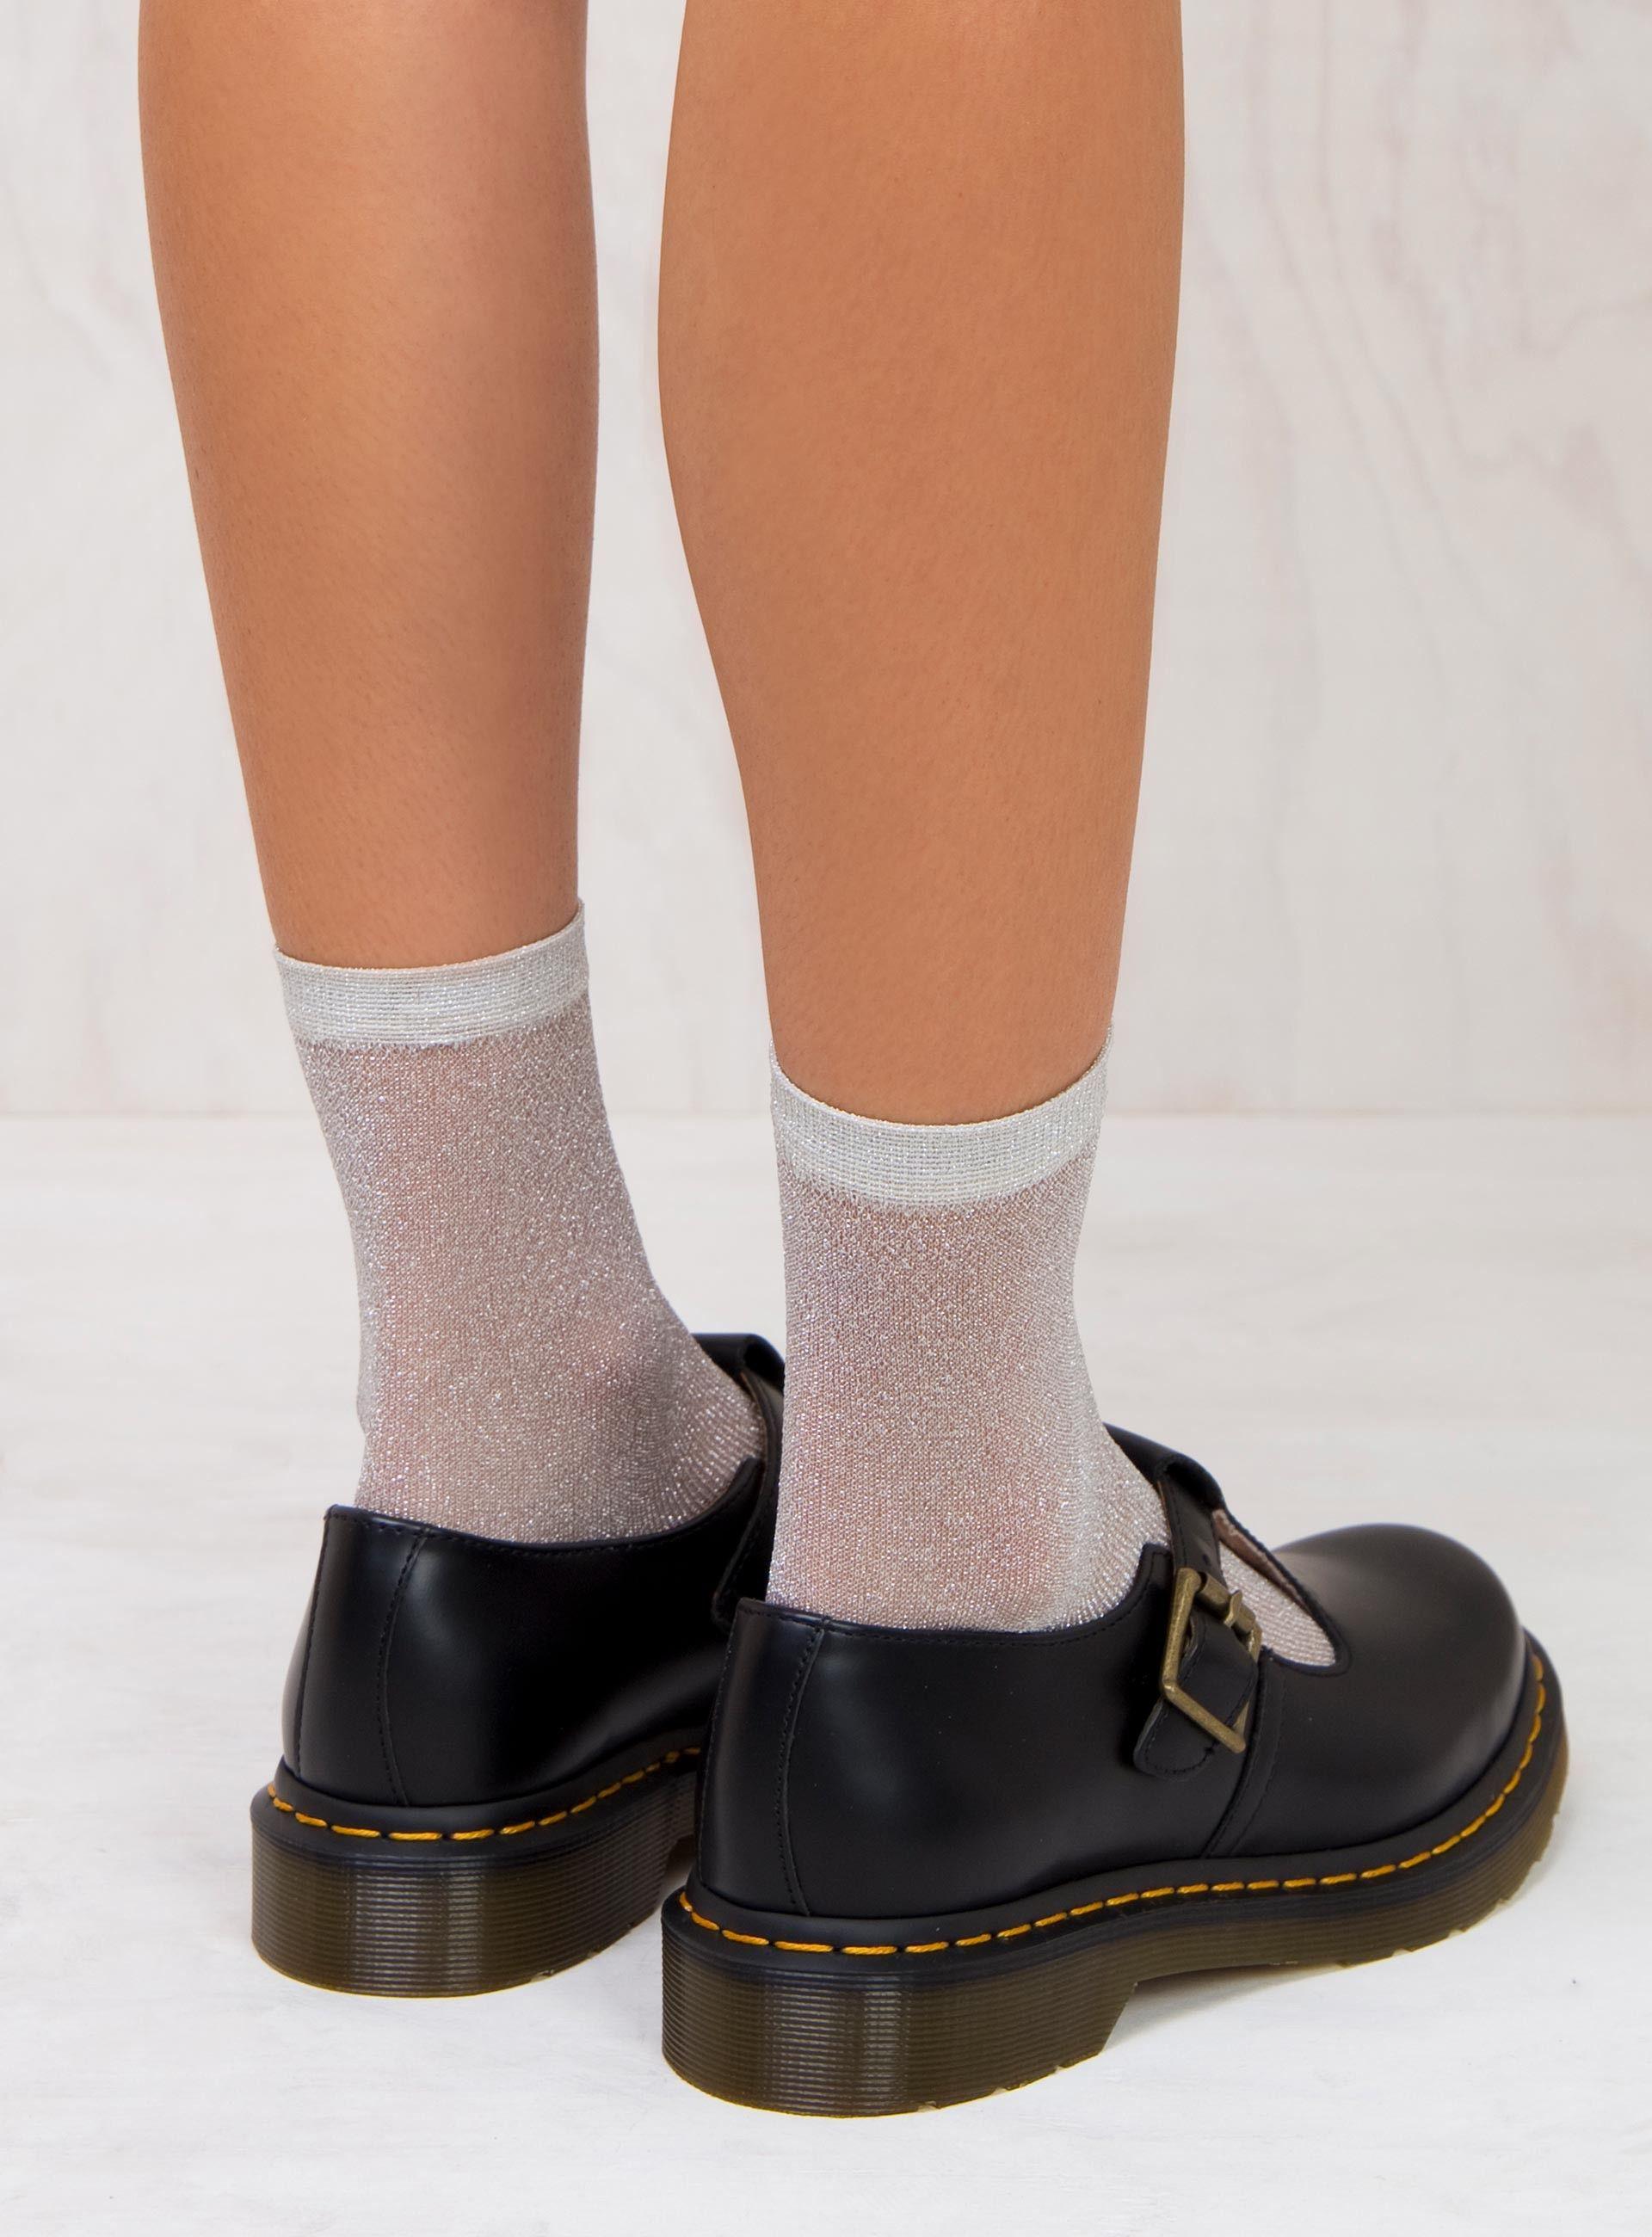 Dr. Martens Polley T-Bar M Jane Shoes